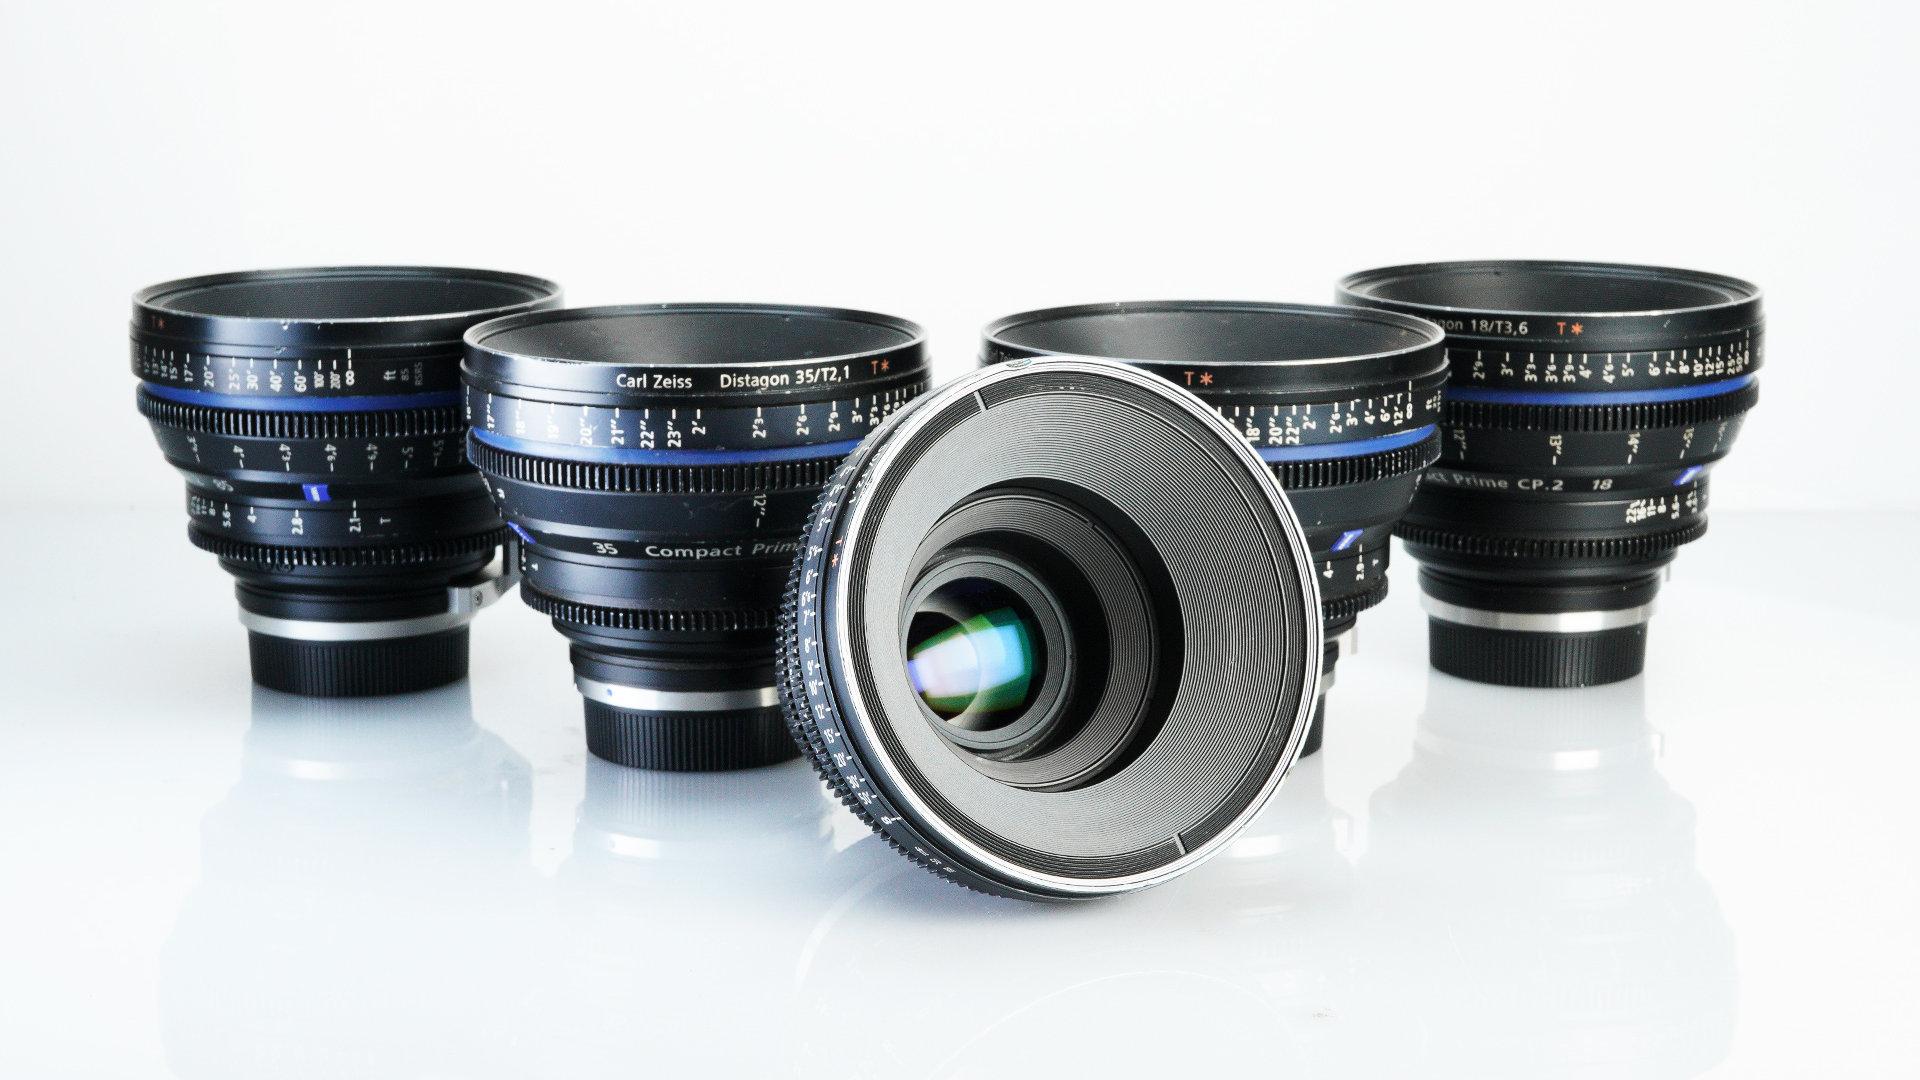 Zeiss Compact Primes CP 2 - 7 Lens Set